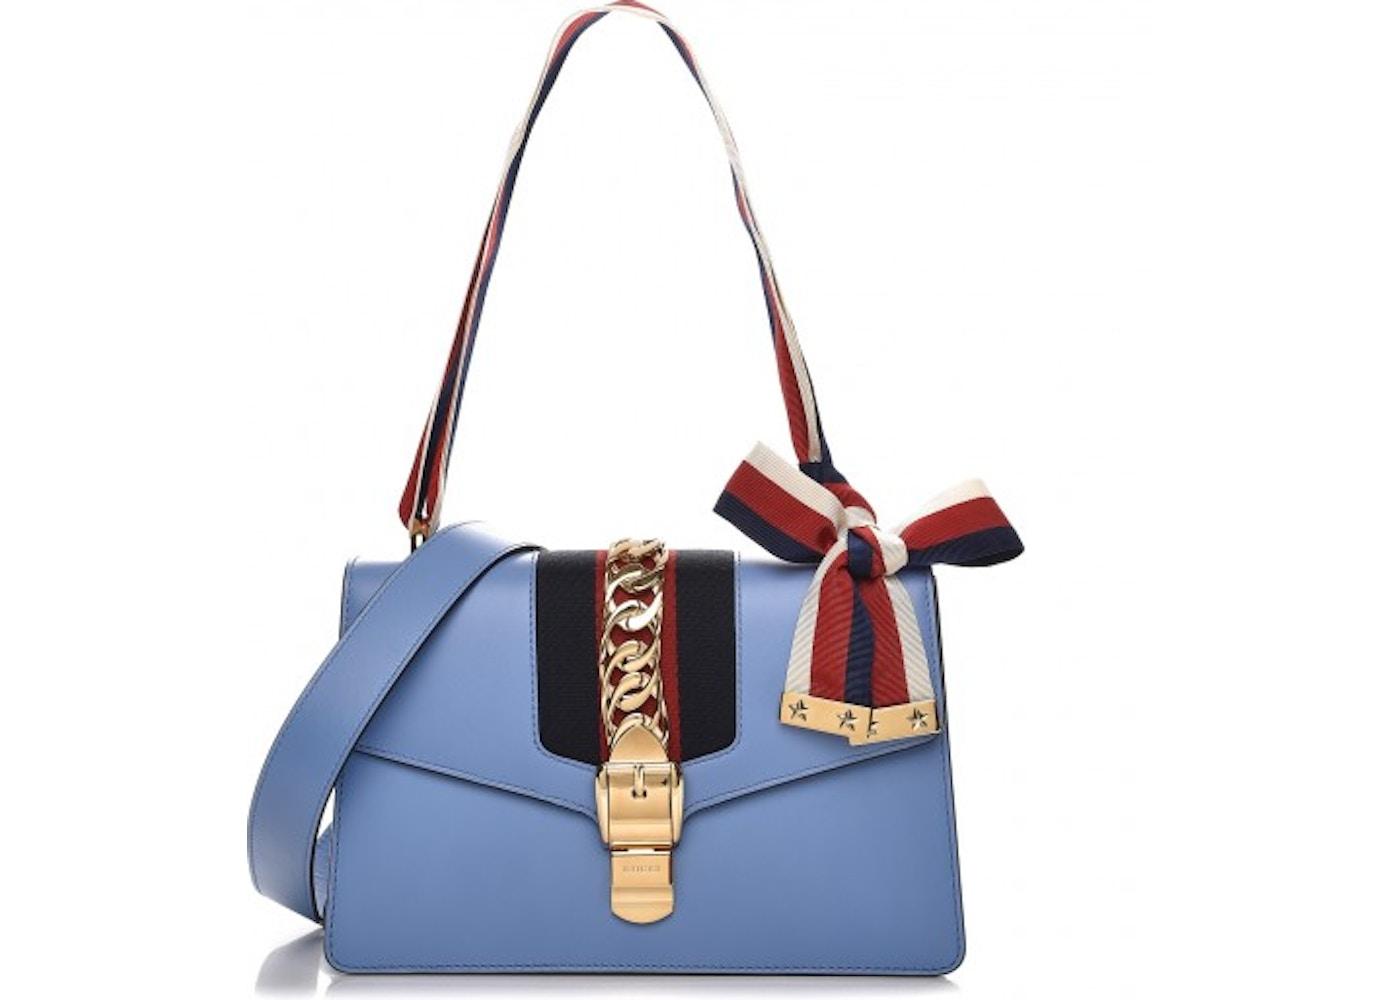 f5a4c68fa4bc19 Gucci Sylvie Shoulder Small Light Blue. Small Light Blue